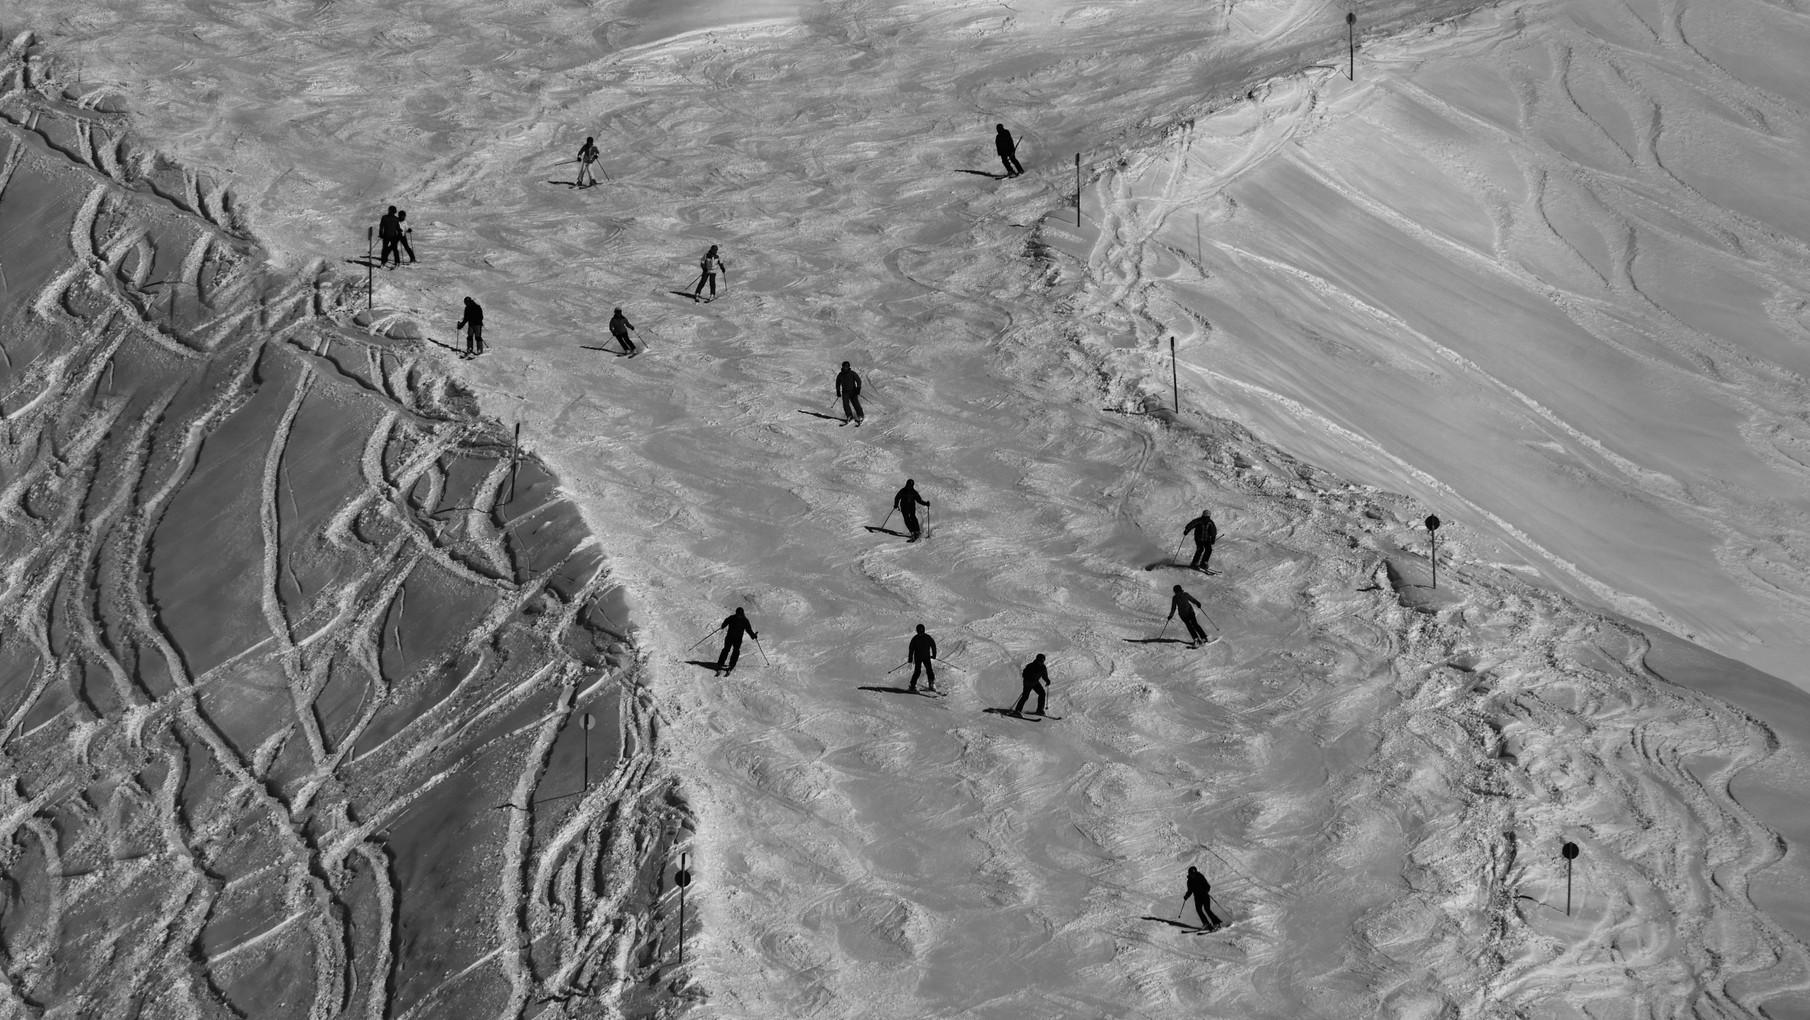 esquiadores-st-anthon.jpg